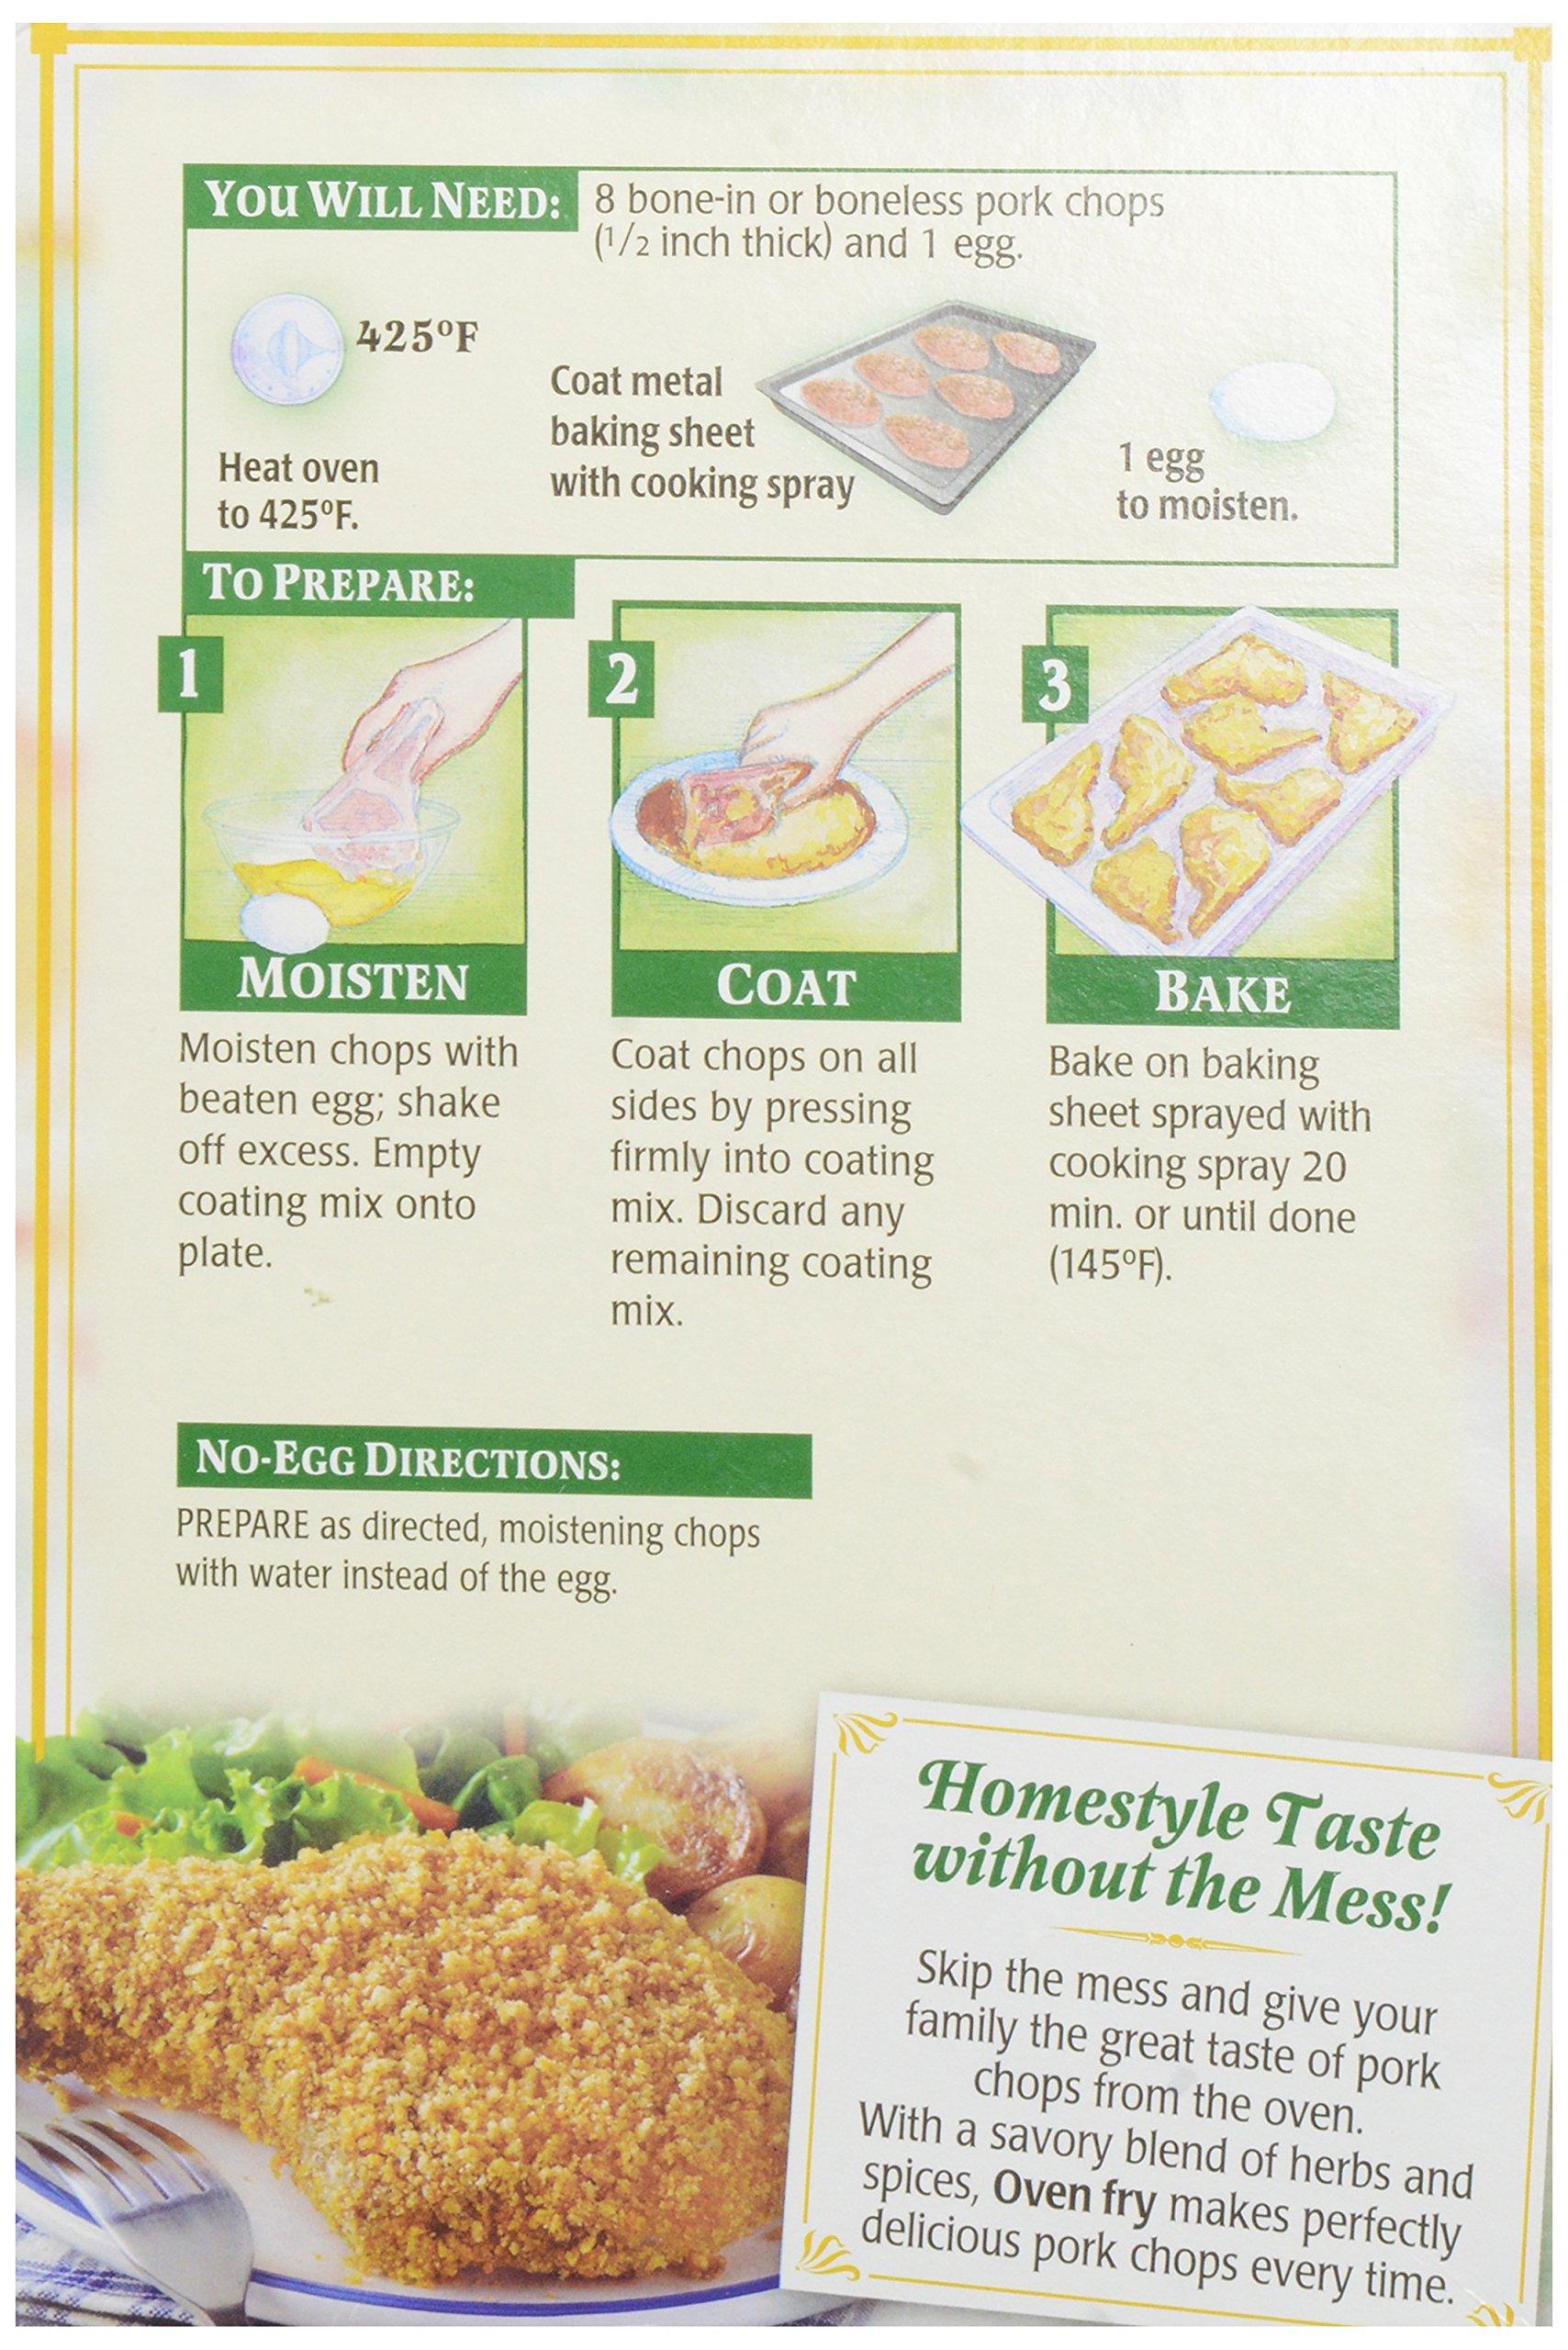 Kraft Oven Fry Seasoned Coating Mix for Pork, Extra Crispy, 4.2 oz(pack of 8) by Kraft Oven Fry (Image #5)